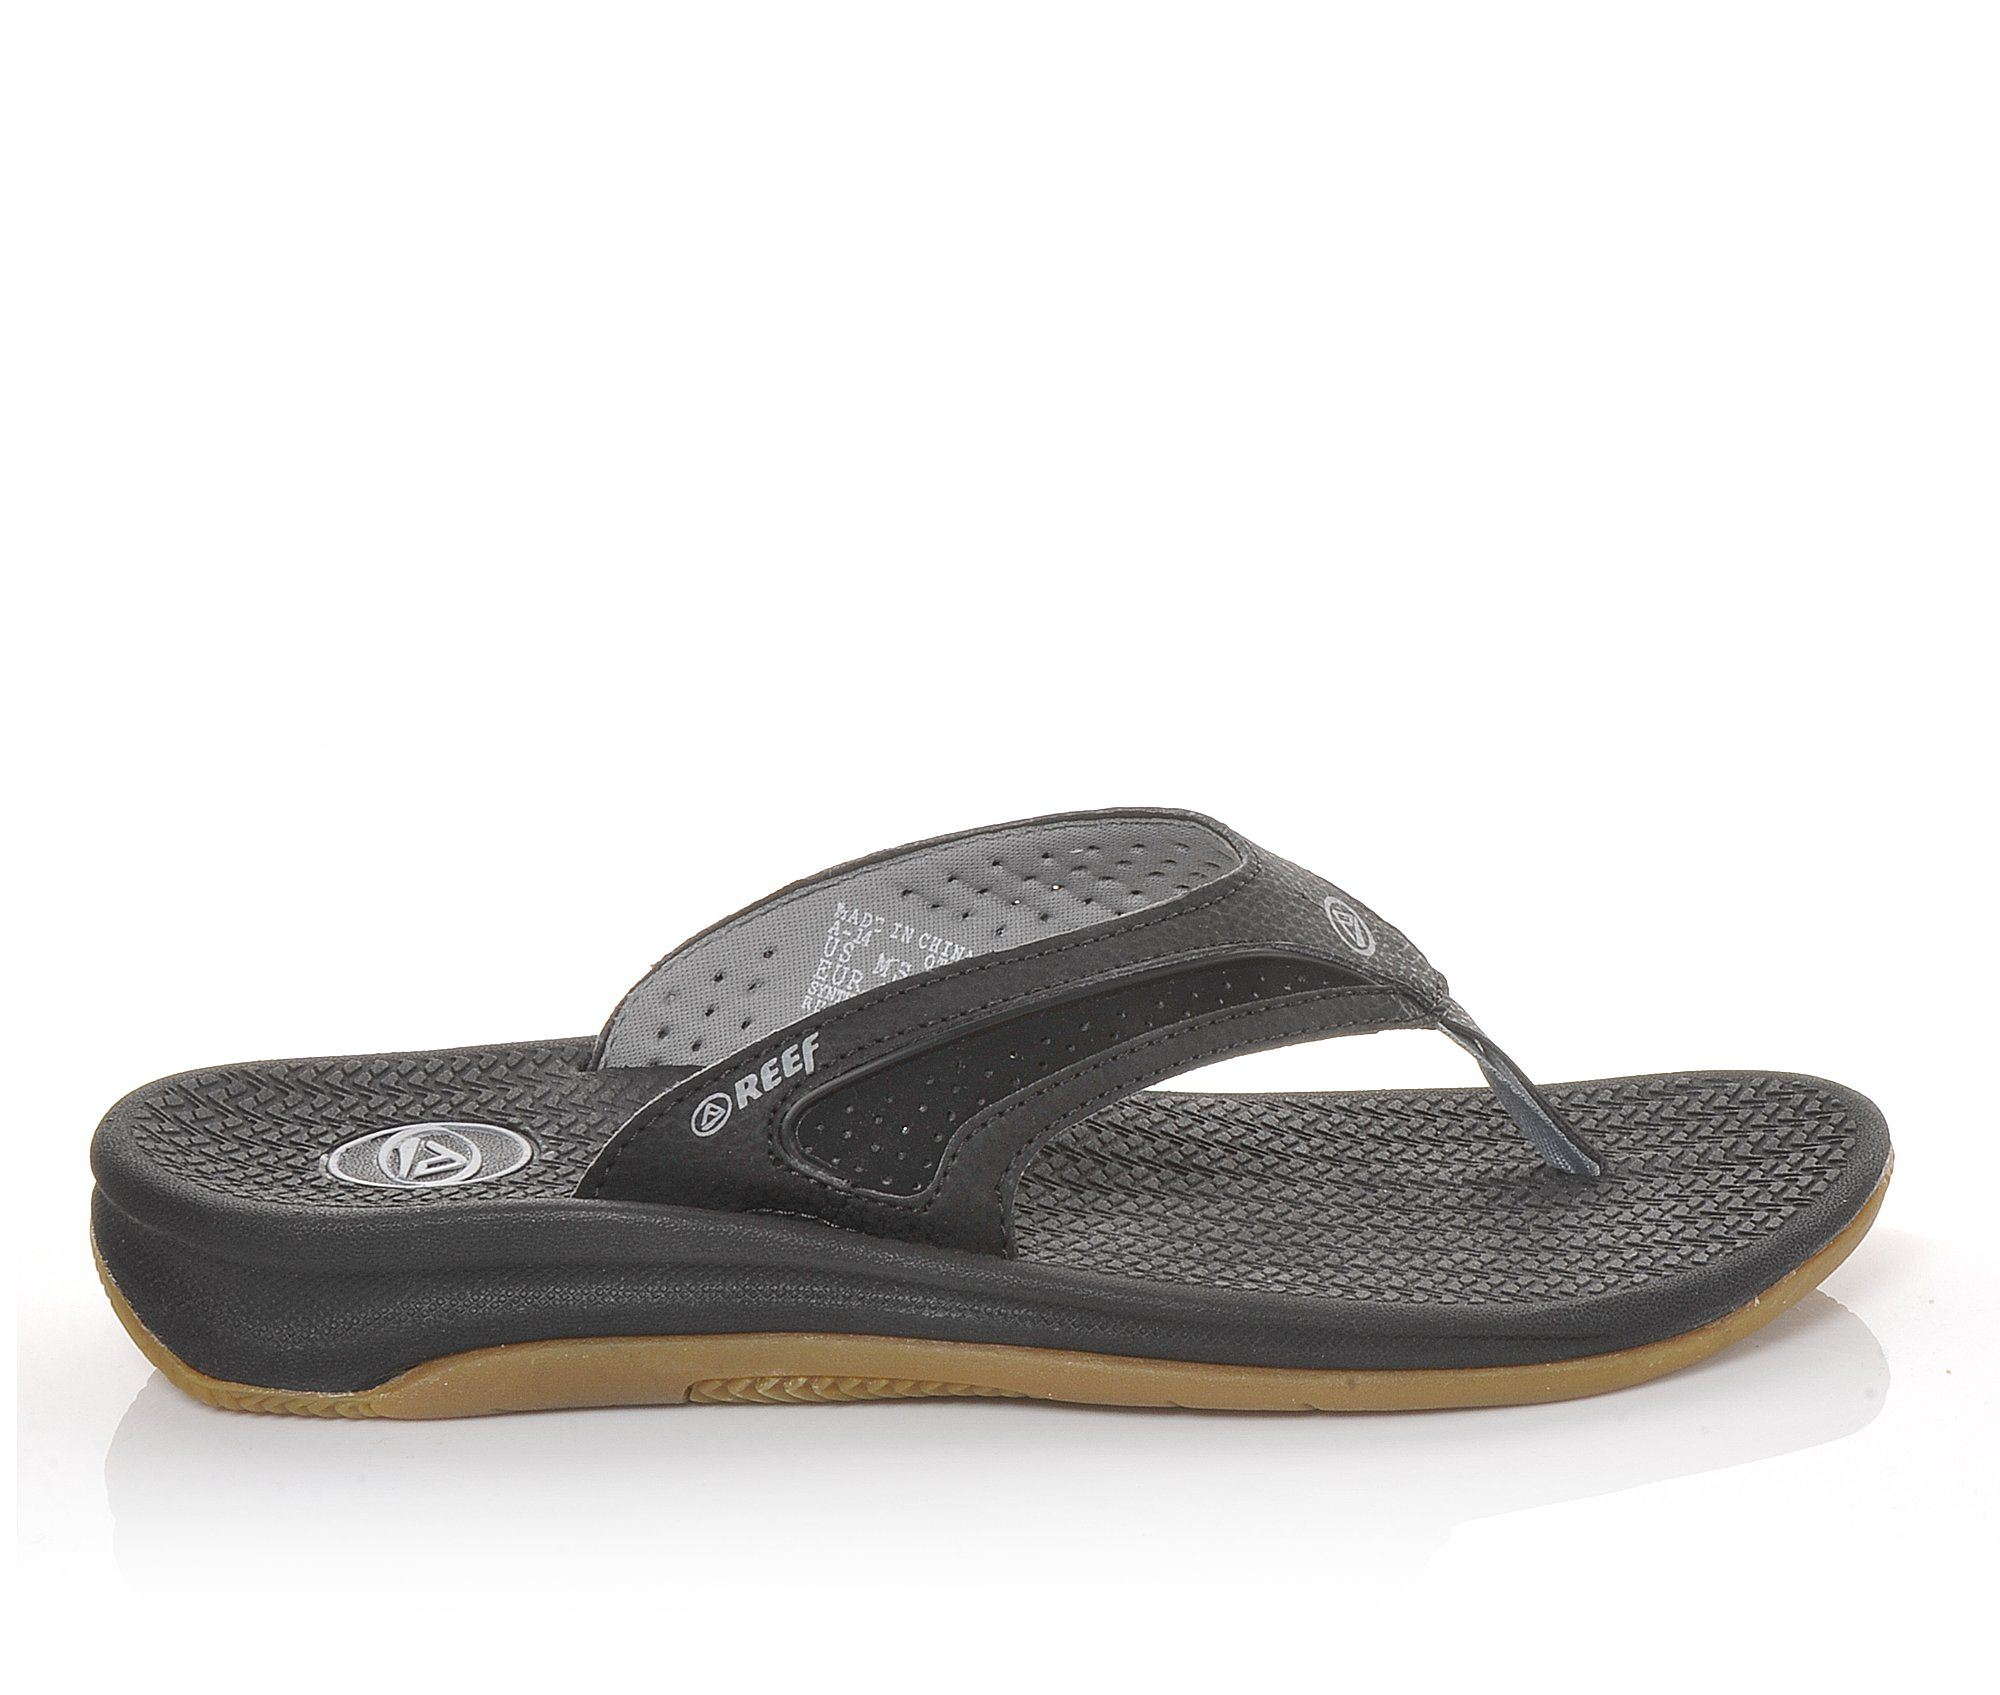 Men's Reef Flex Sandals (Black)